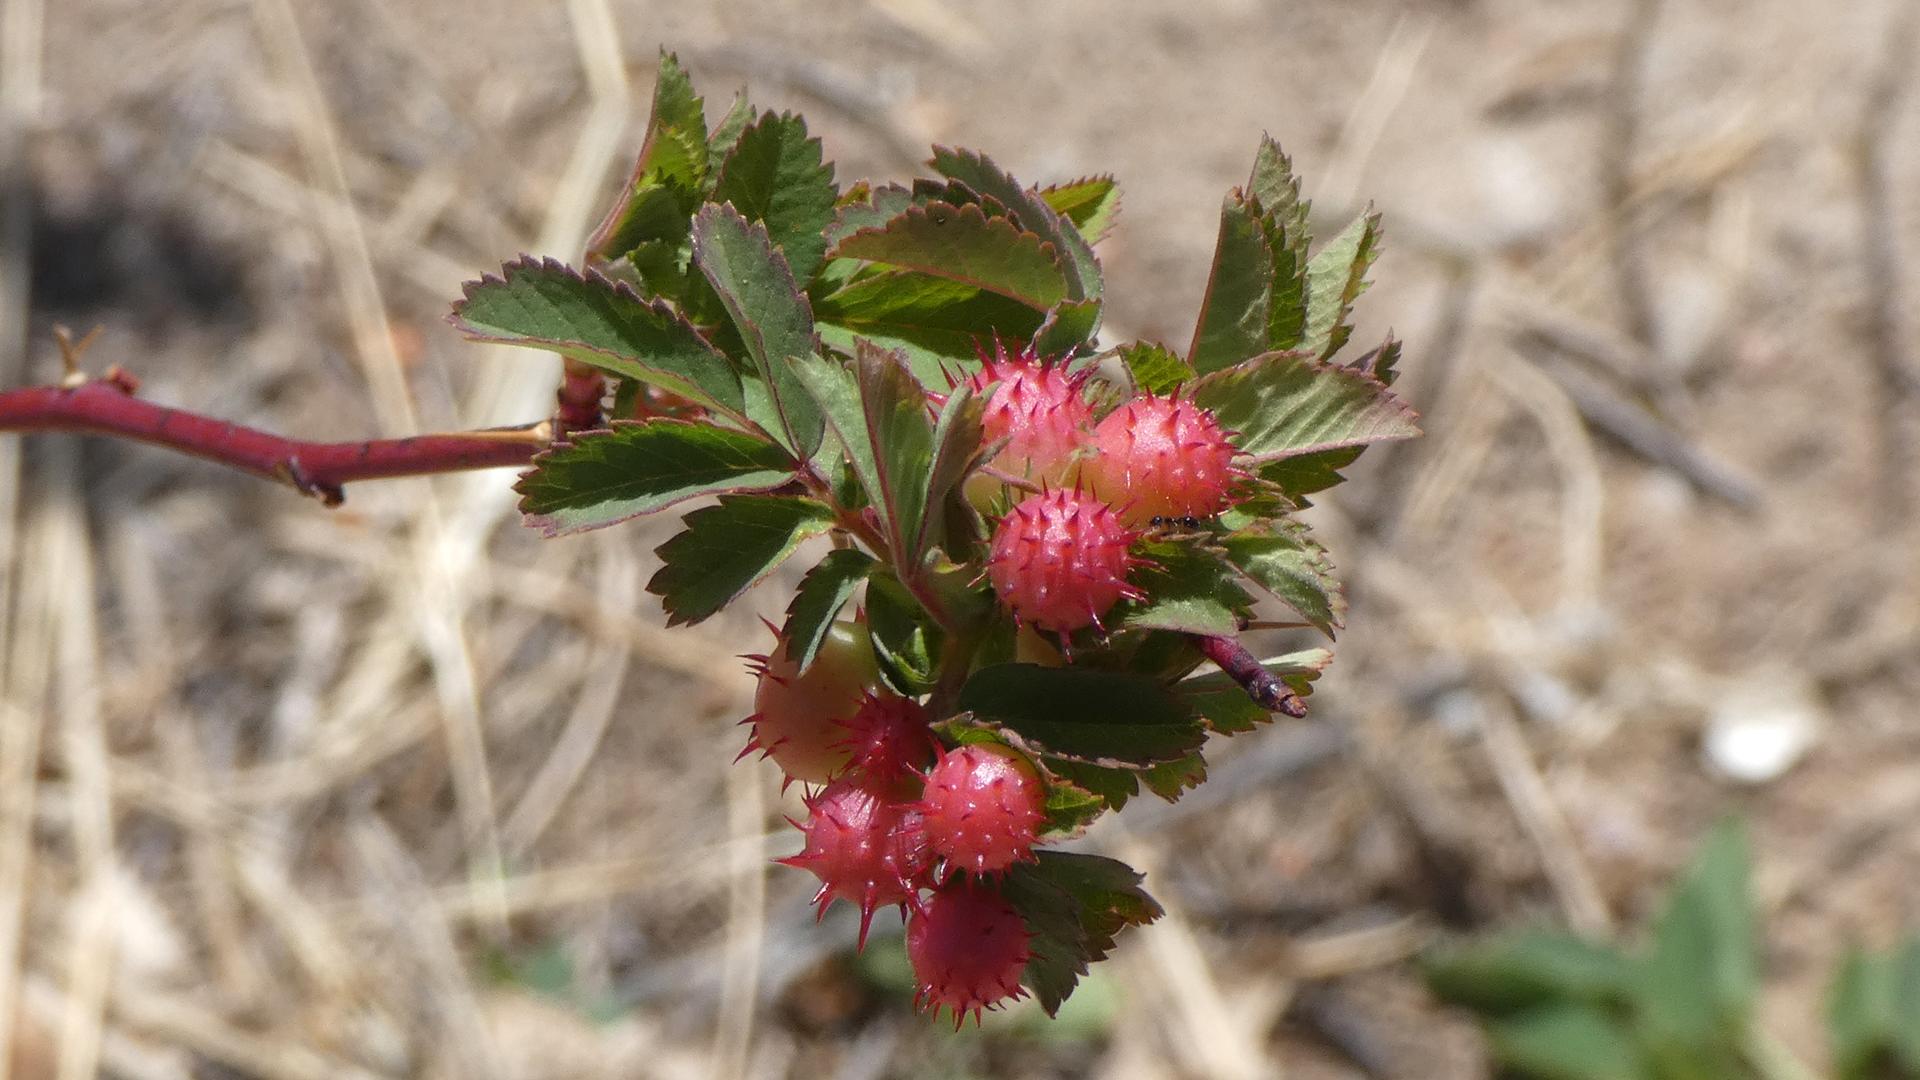 On wild rose, Rio Grande Bosque, Albuquerque, April 2021